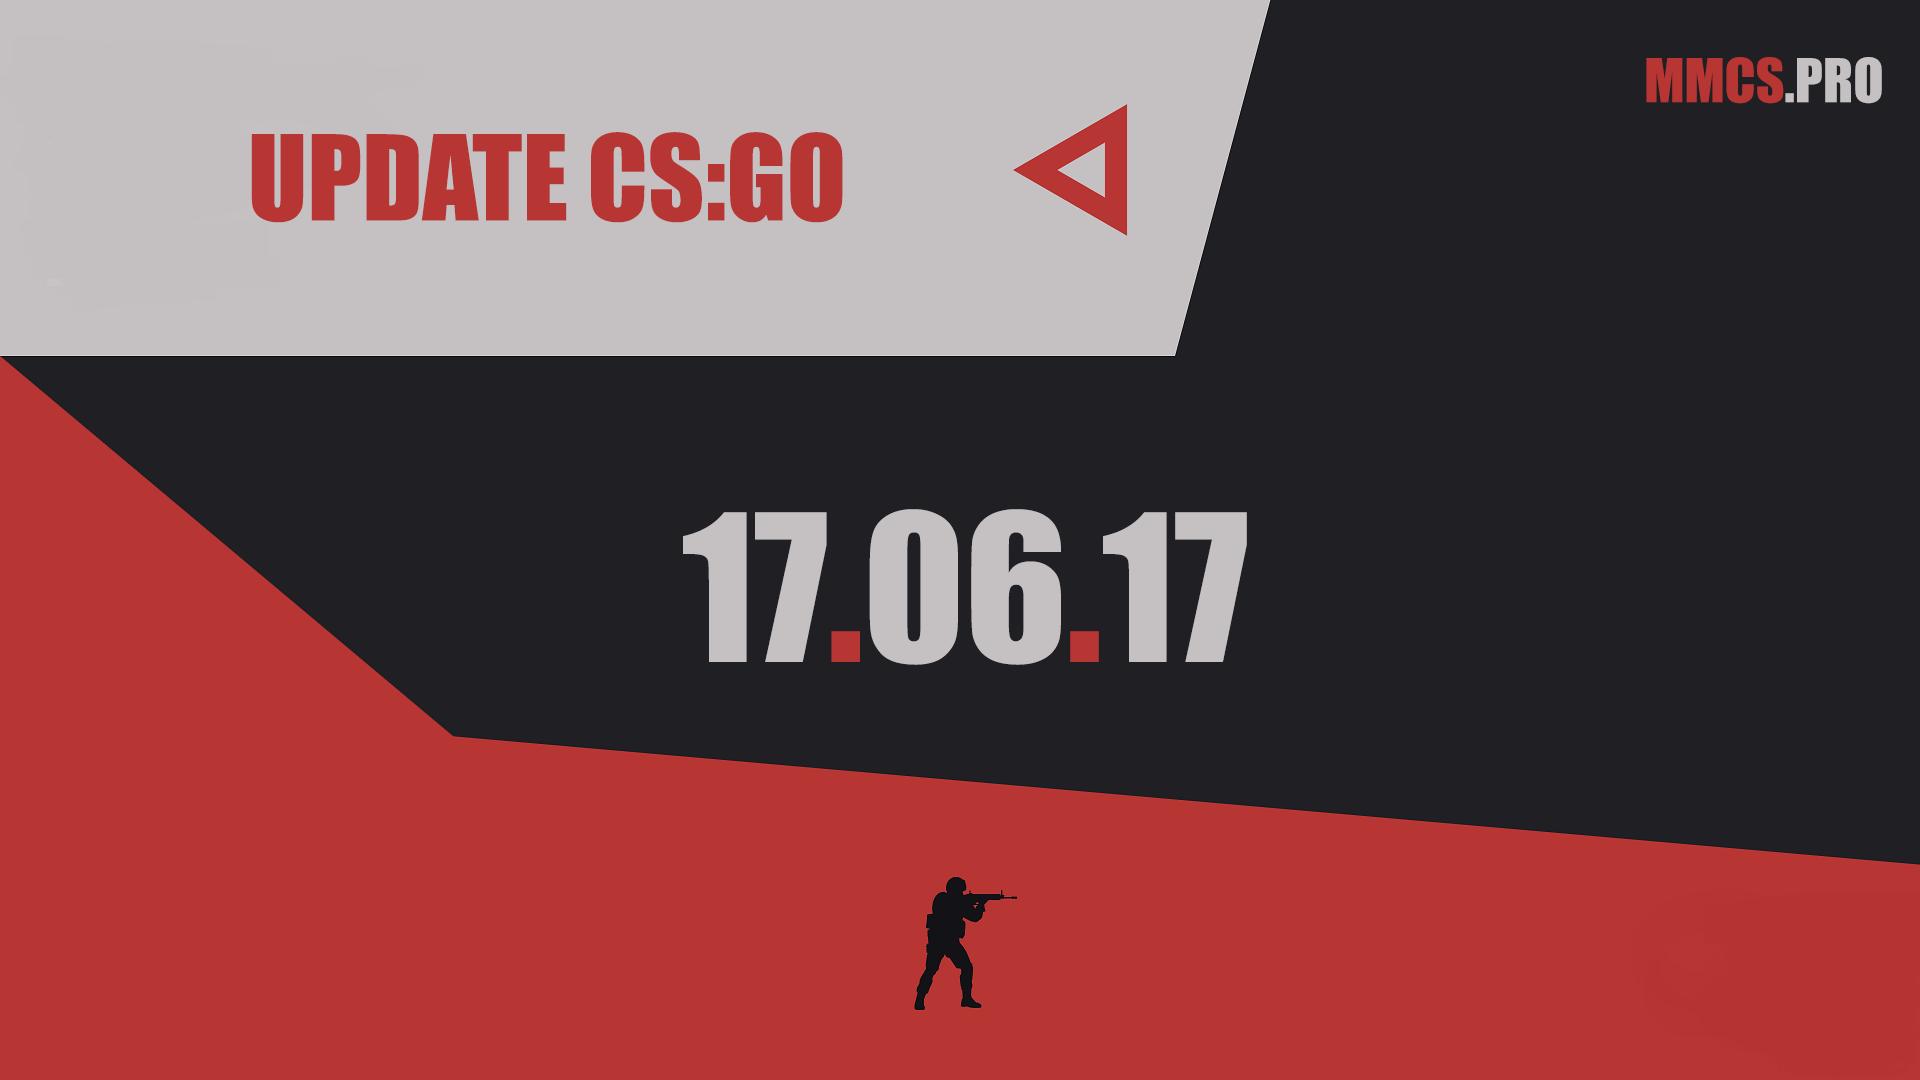 https://mmcs.pro/update-csgo-17-06-2017-valve/